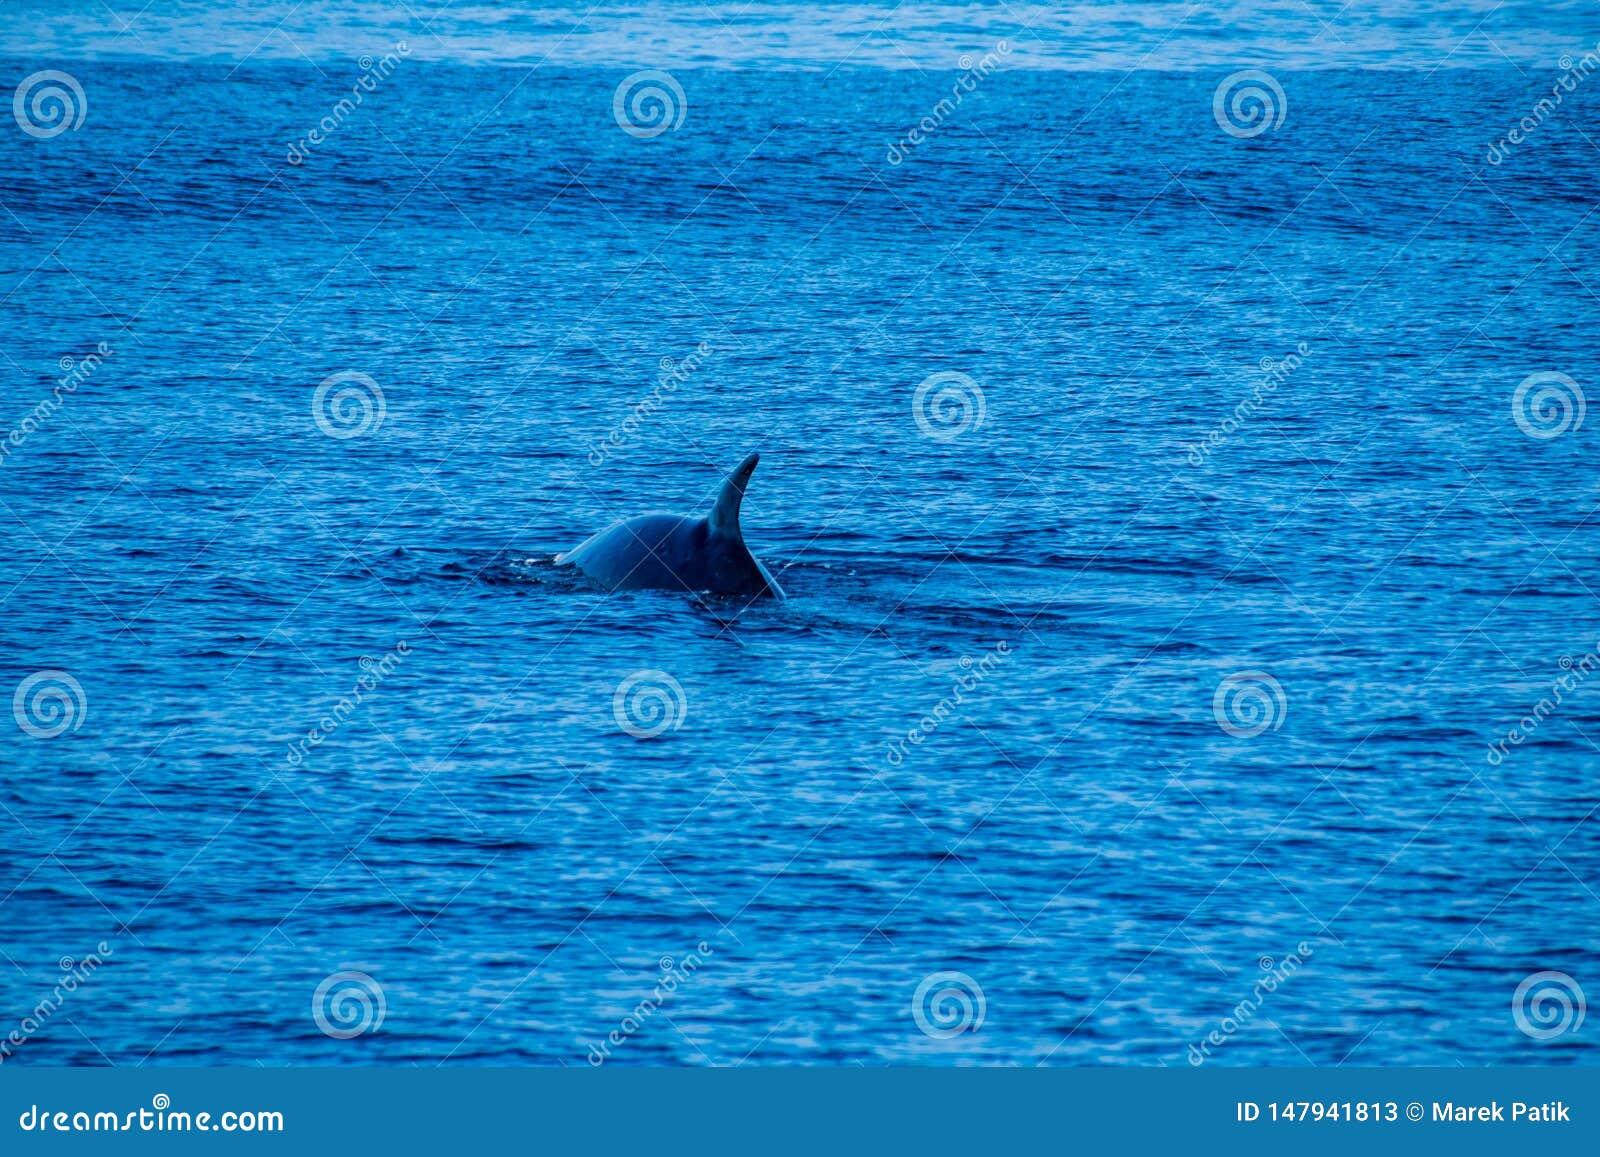 Baleine observant, Açores 2019, près de Ponta Delgada